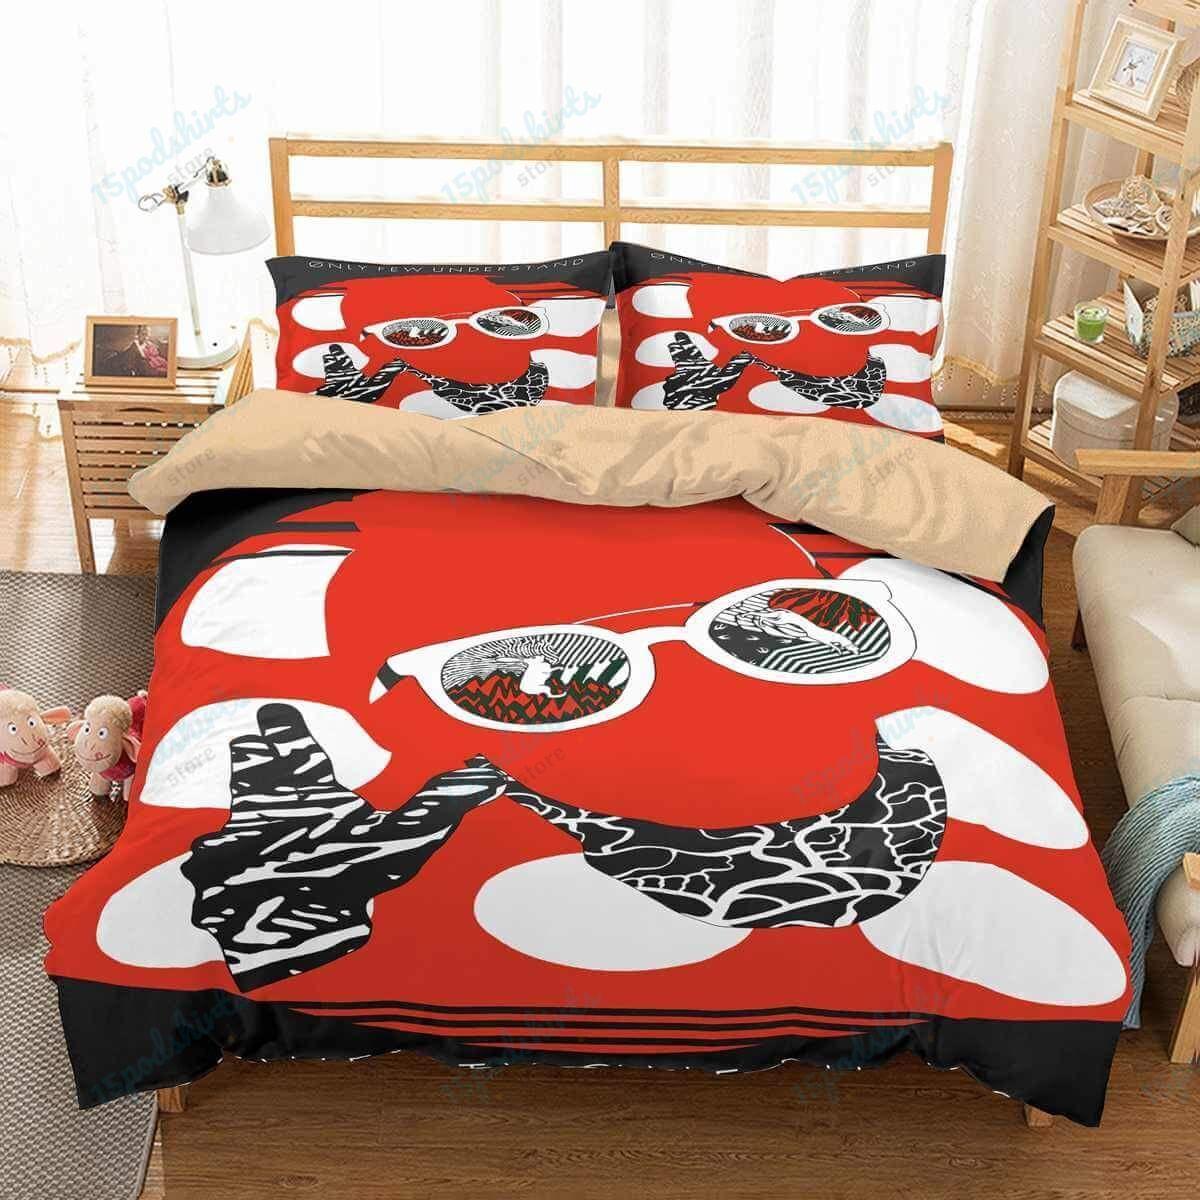 Twenty One Pilots 2 Duvet Cover Bedding Set